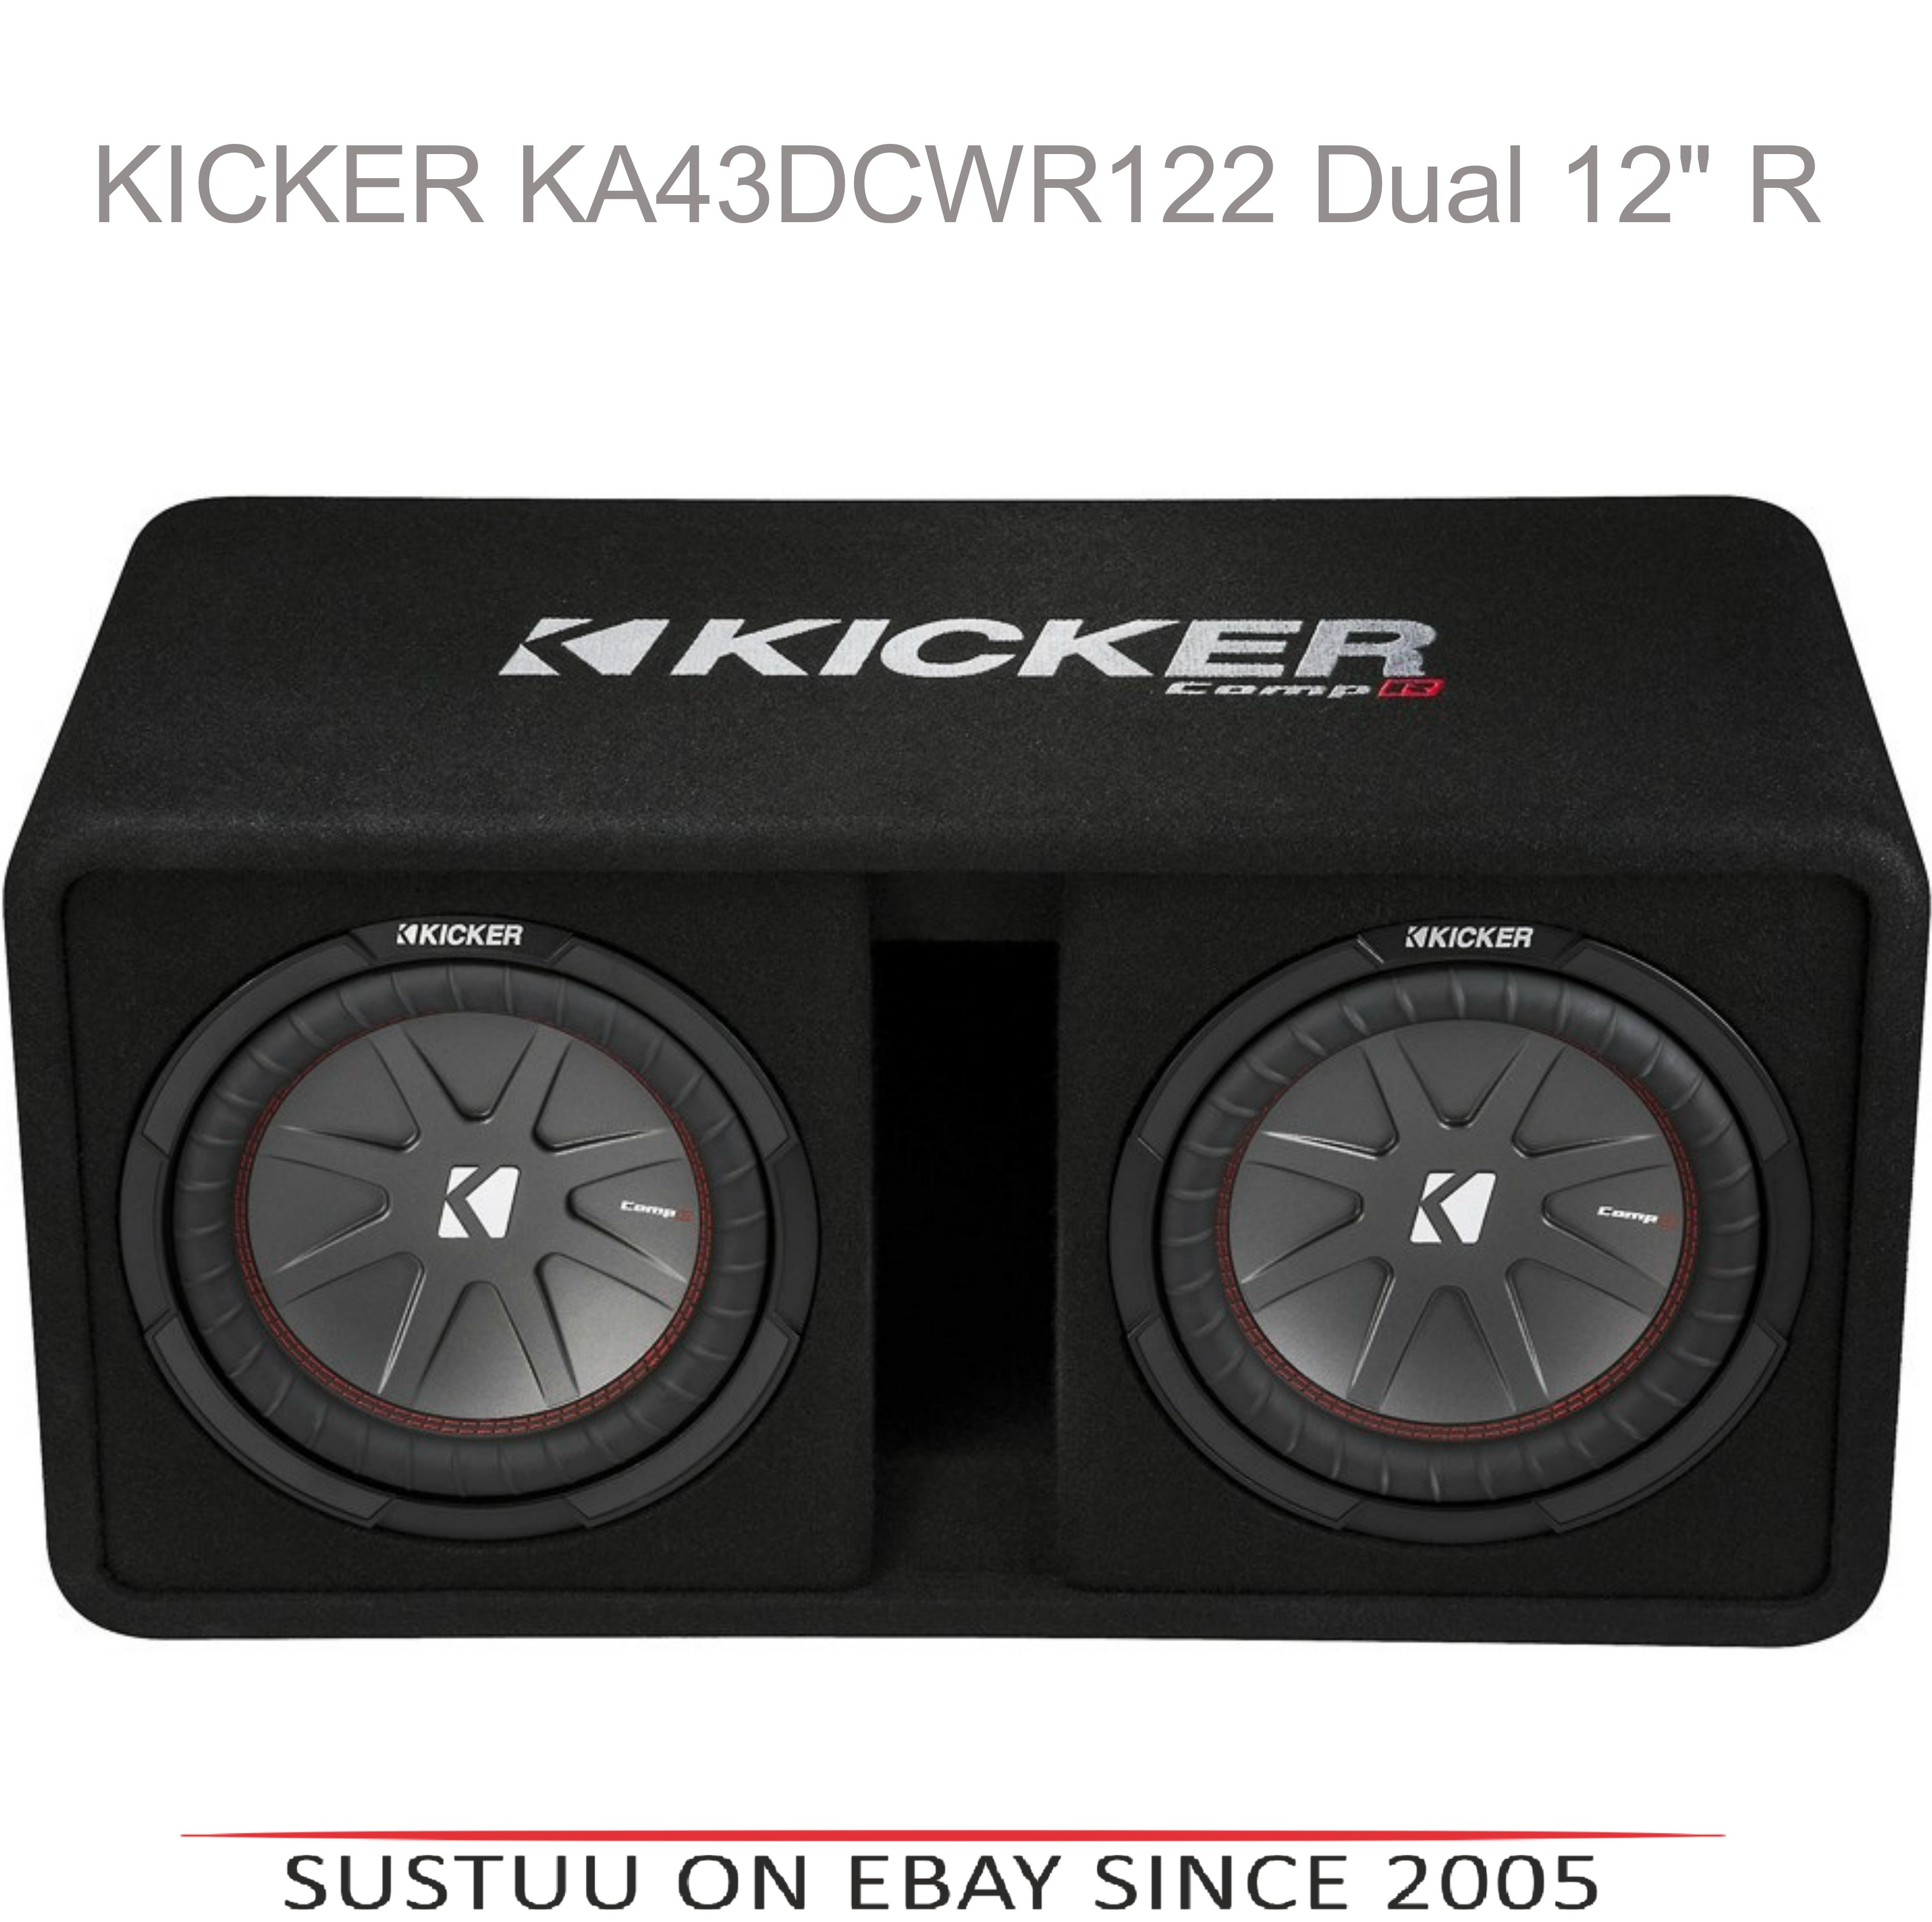 "Kicker KA43DCWR122 12"" Comp R Dual Vented 1000W RMS Car Audio Subwoofer Bass Box"